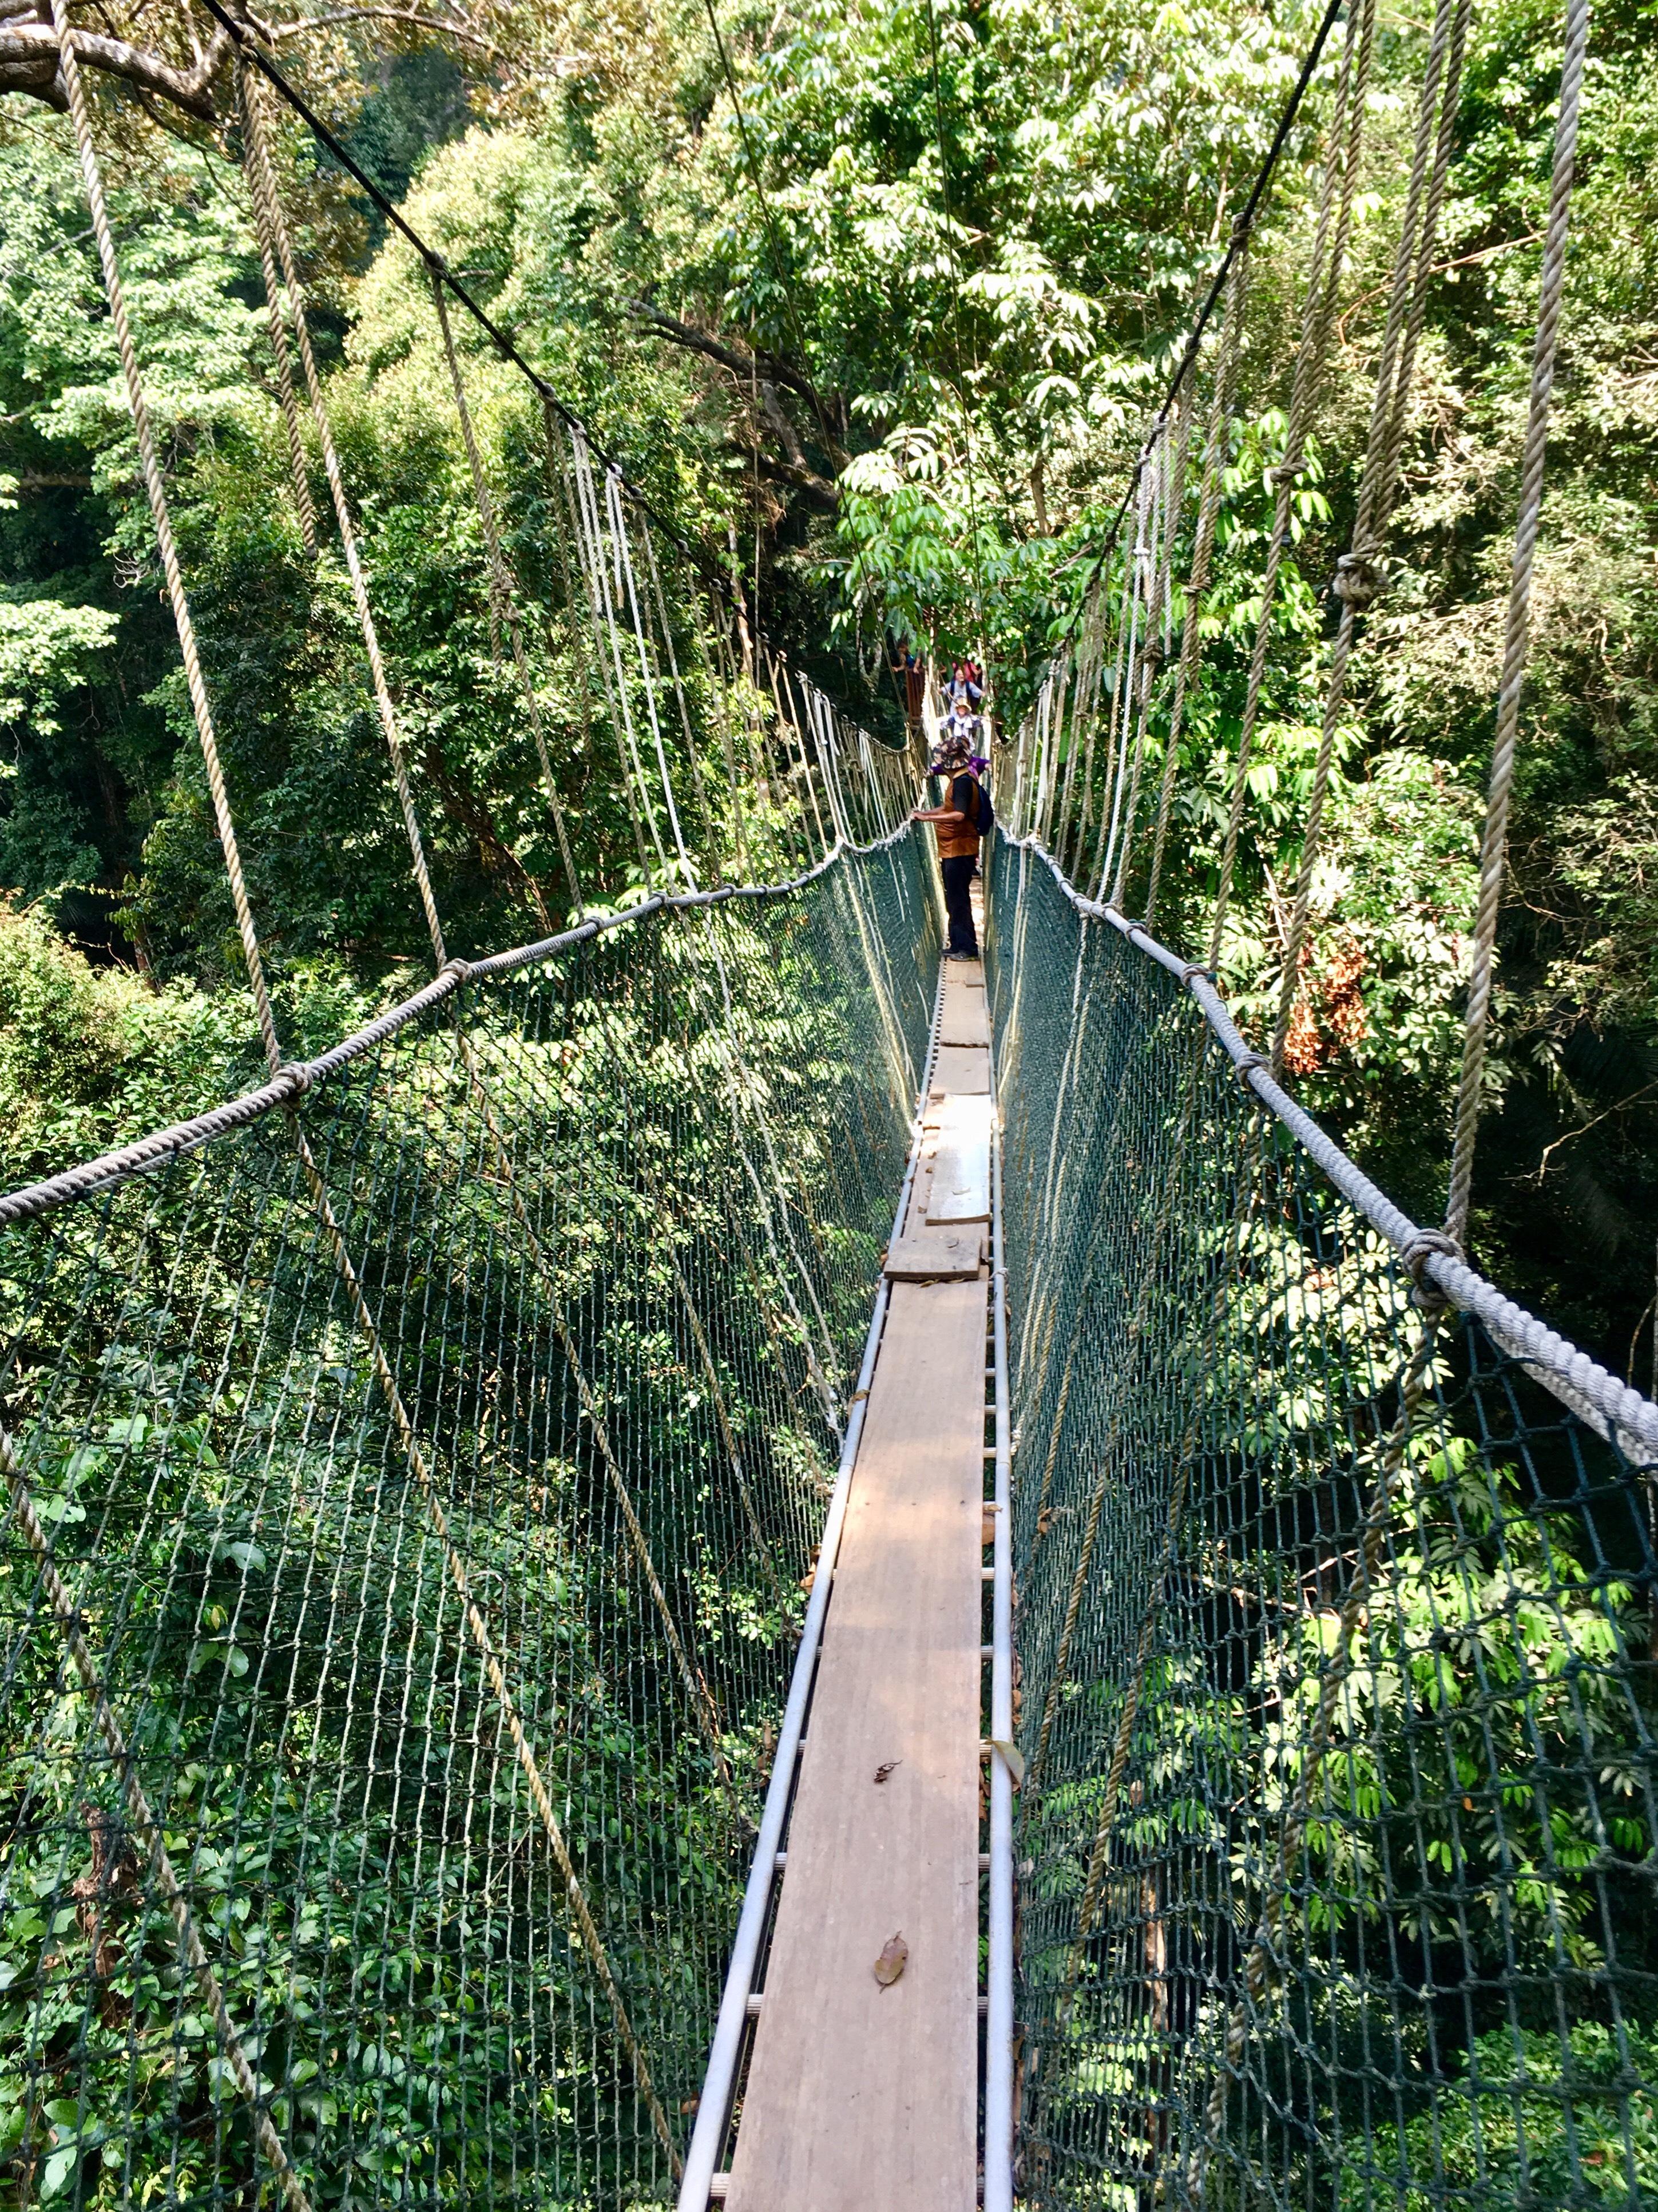 Taman Negara jungle, Malaysia, canopy walk